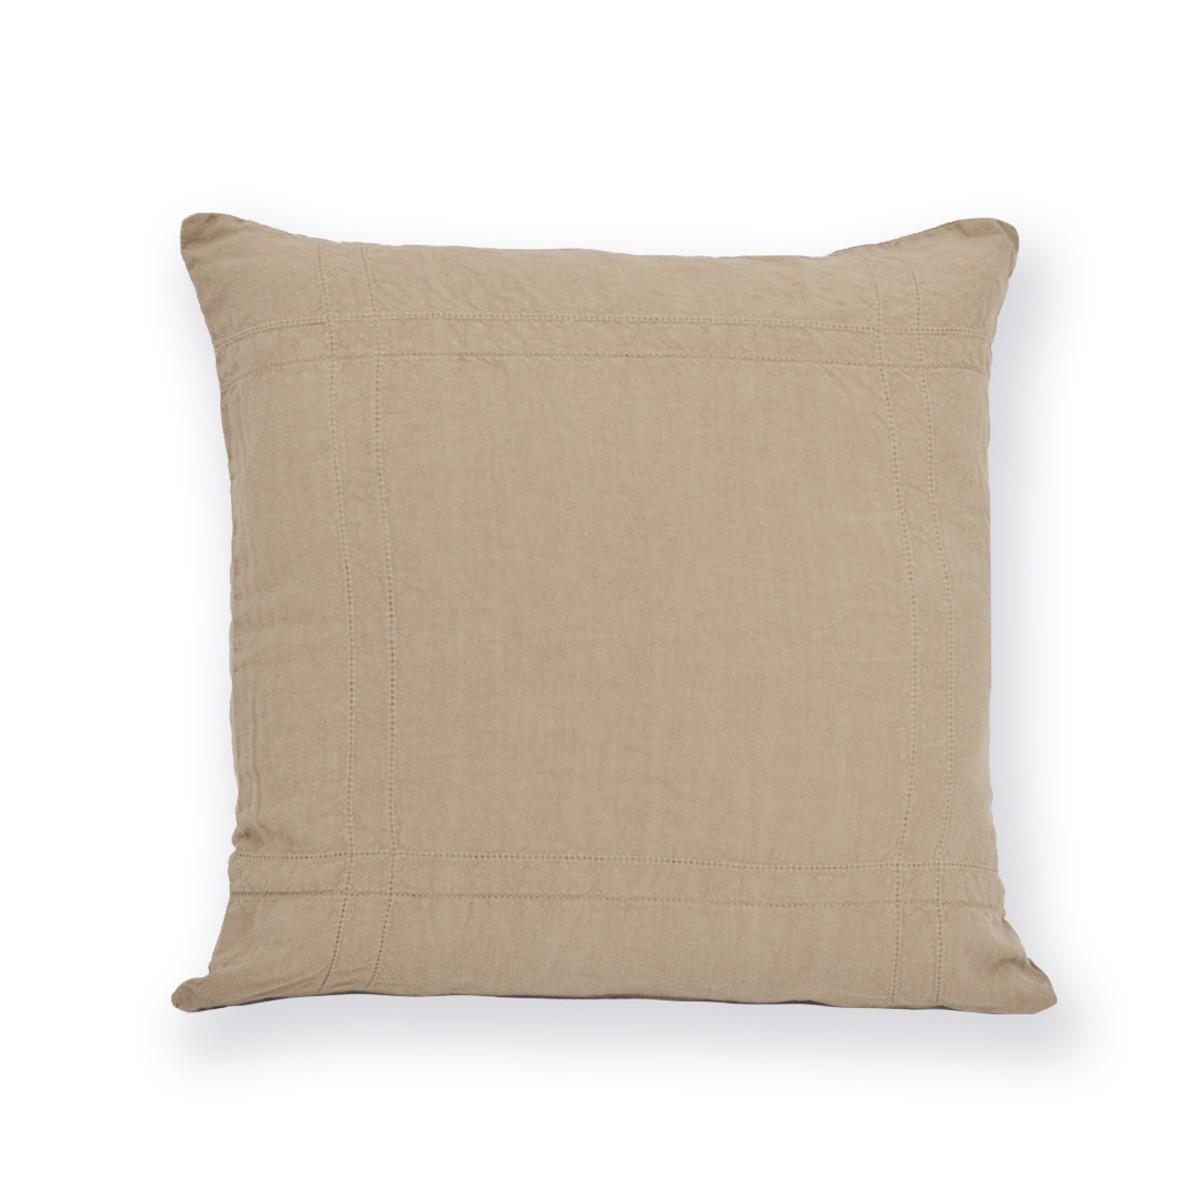 Decorative Pillow, Almalinen